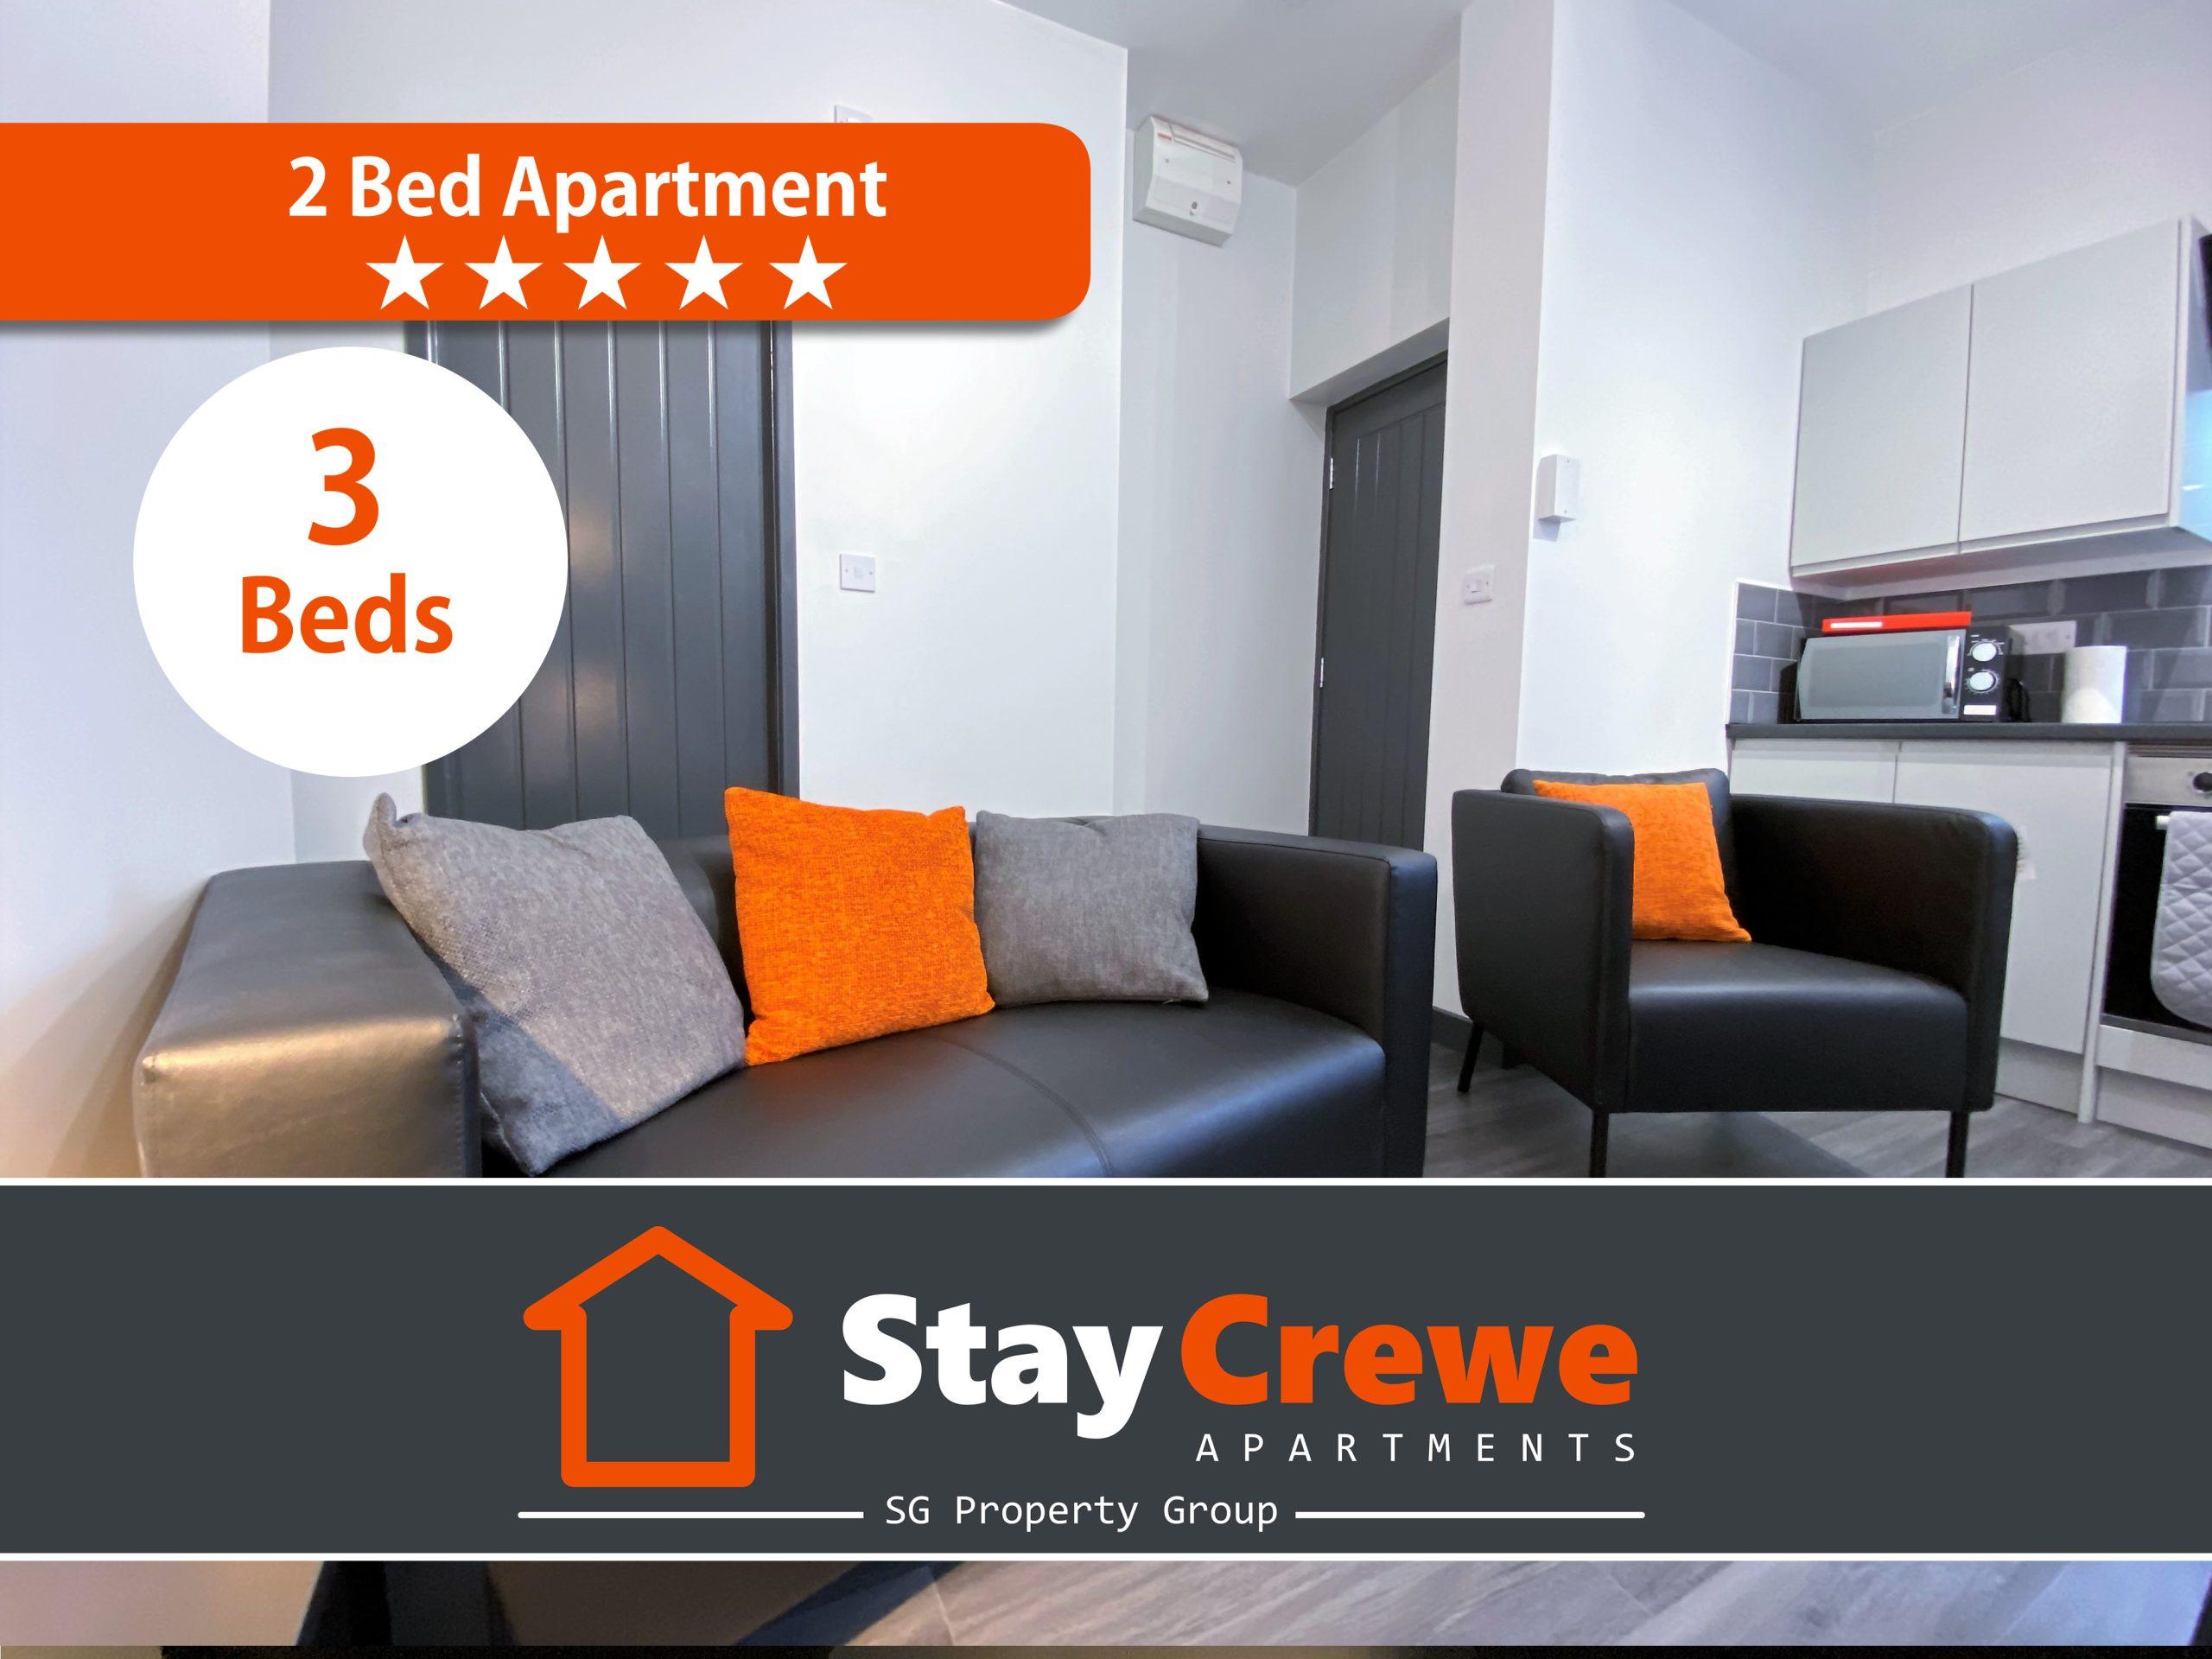 StayCrewe Apartments – Apt 2